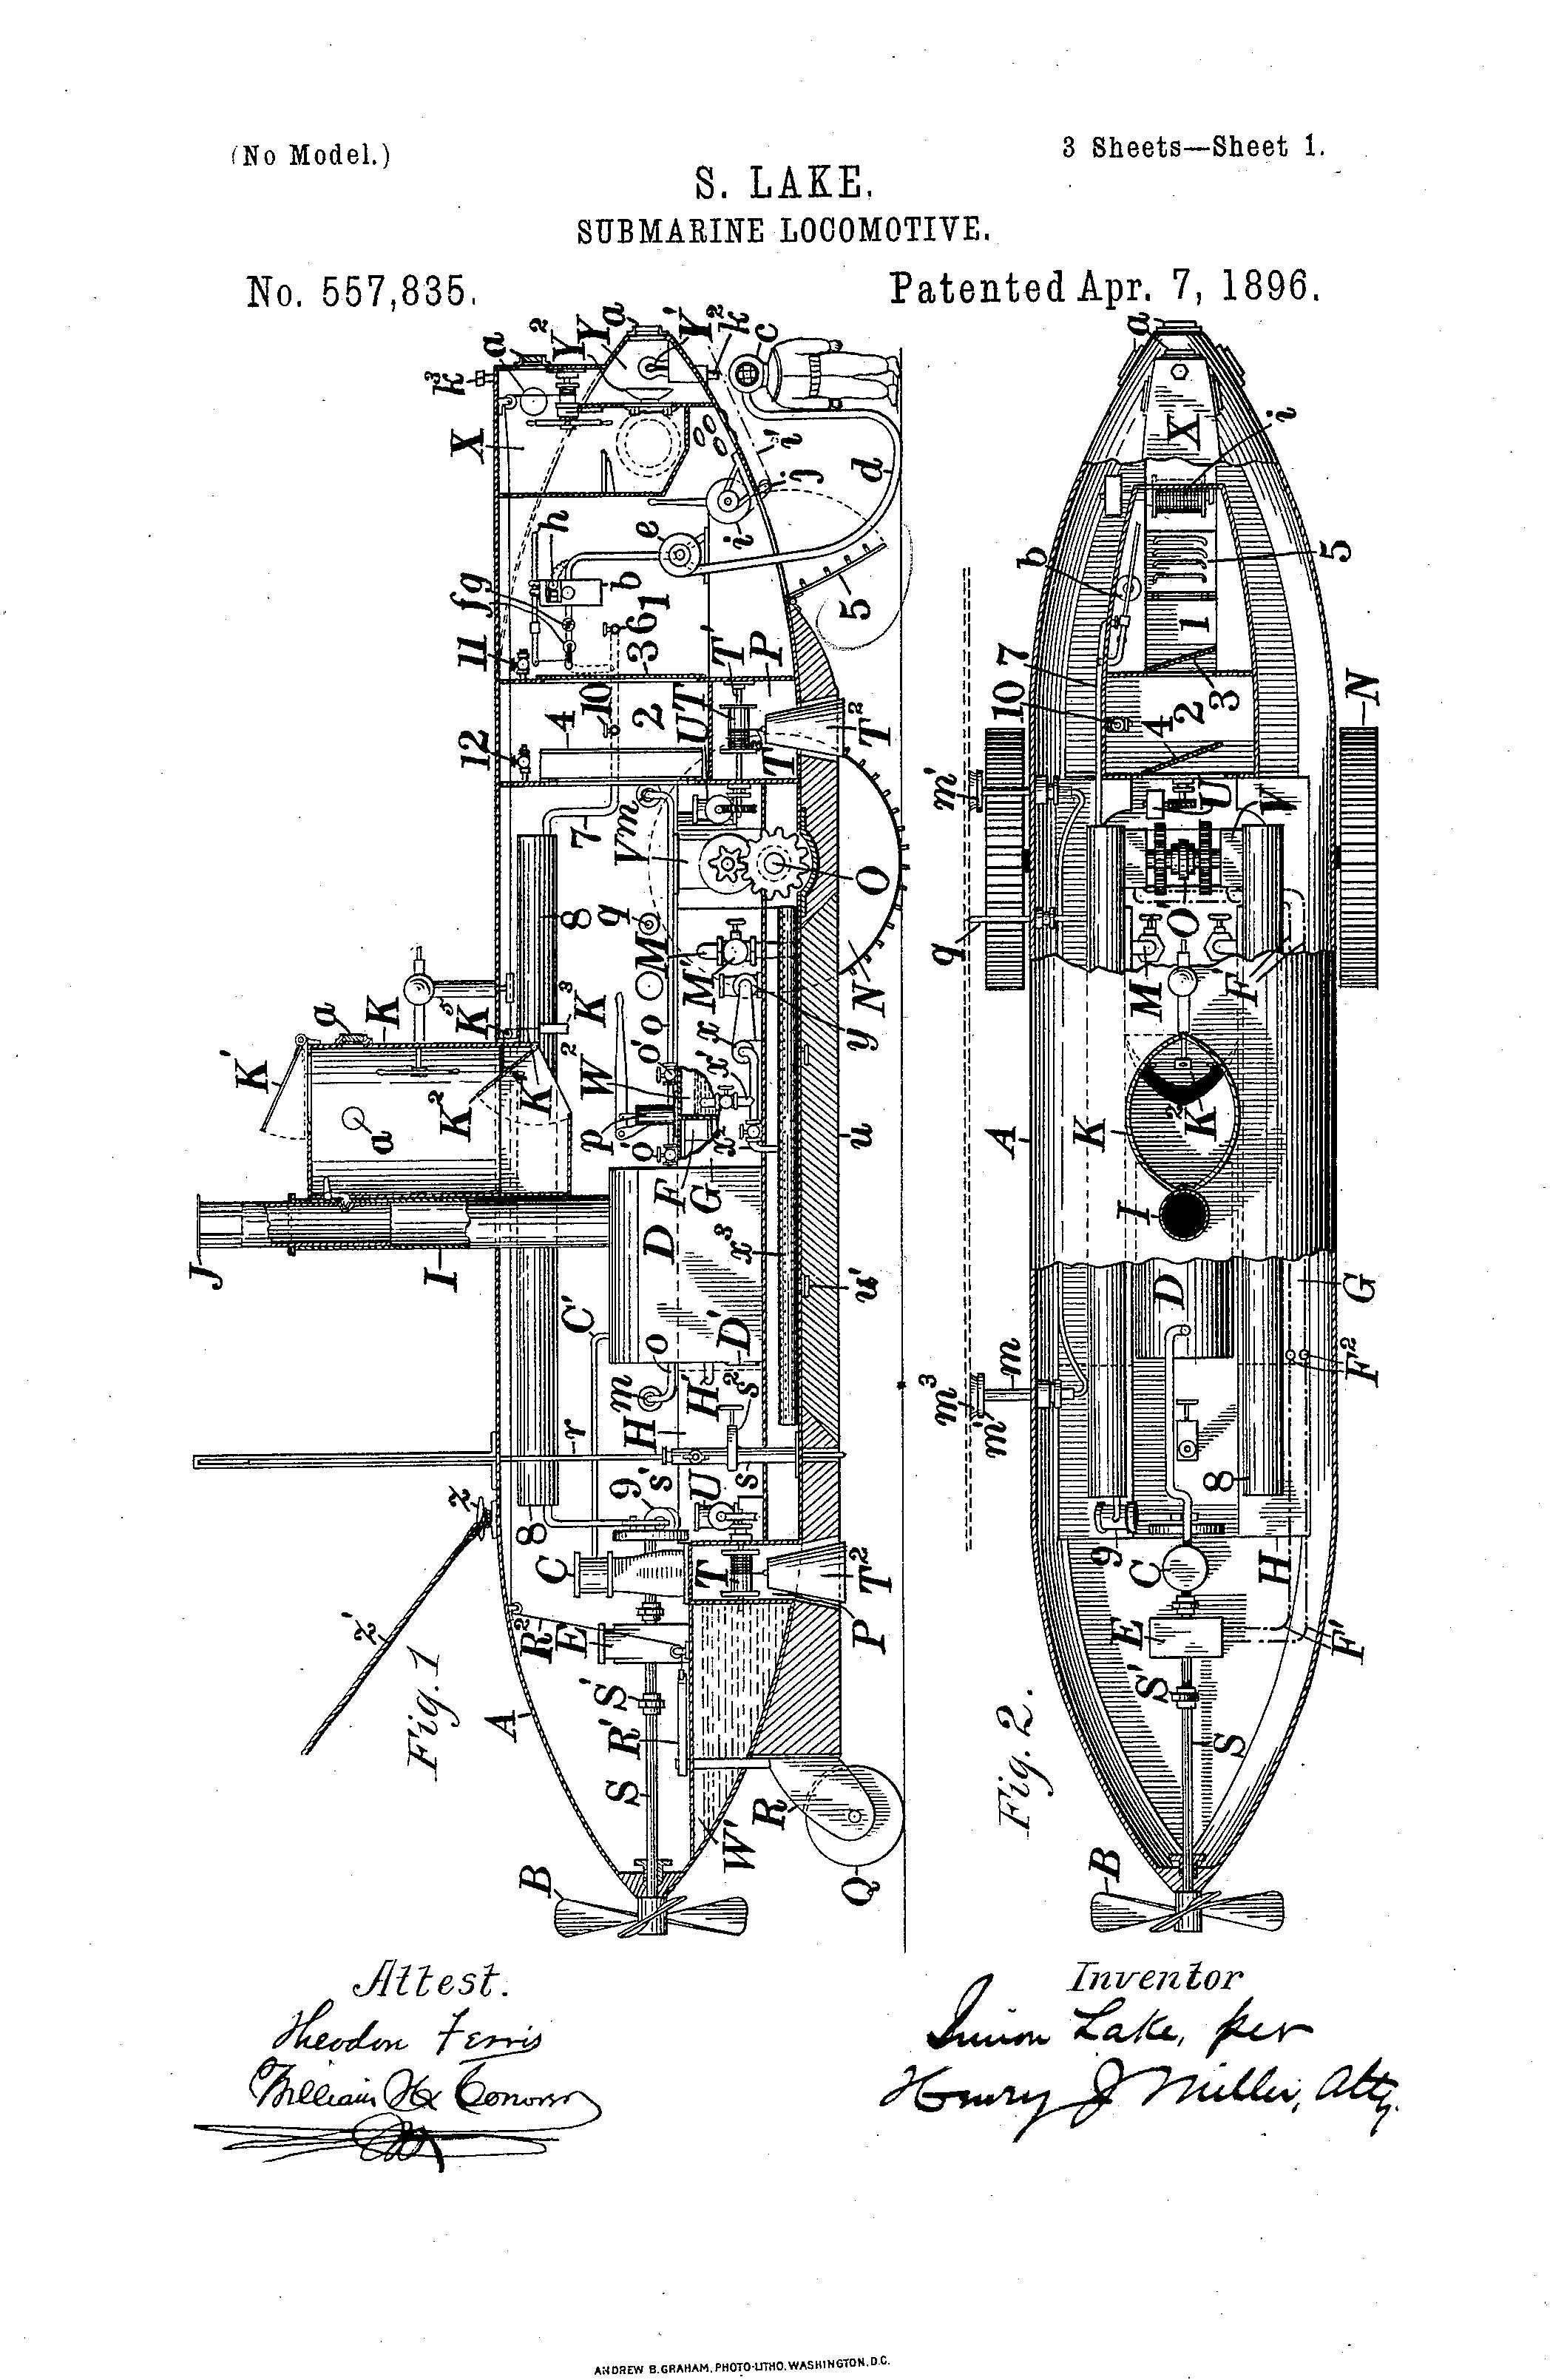 Submarine Locomotive Patented